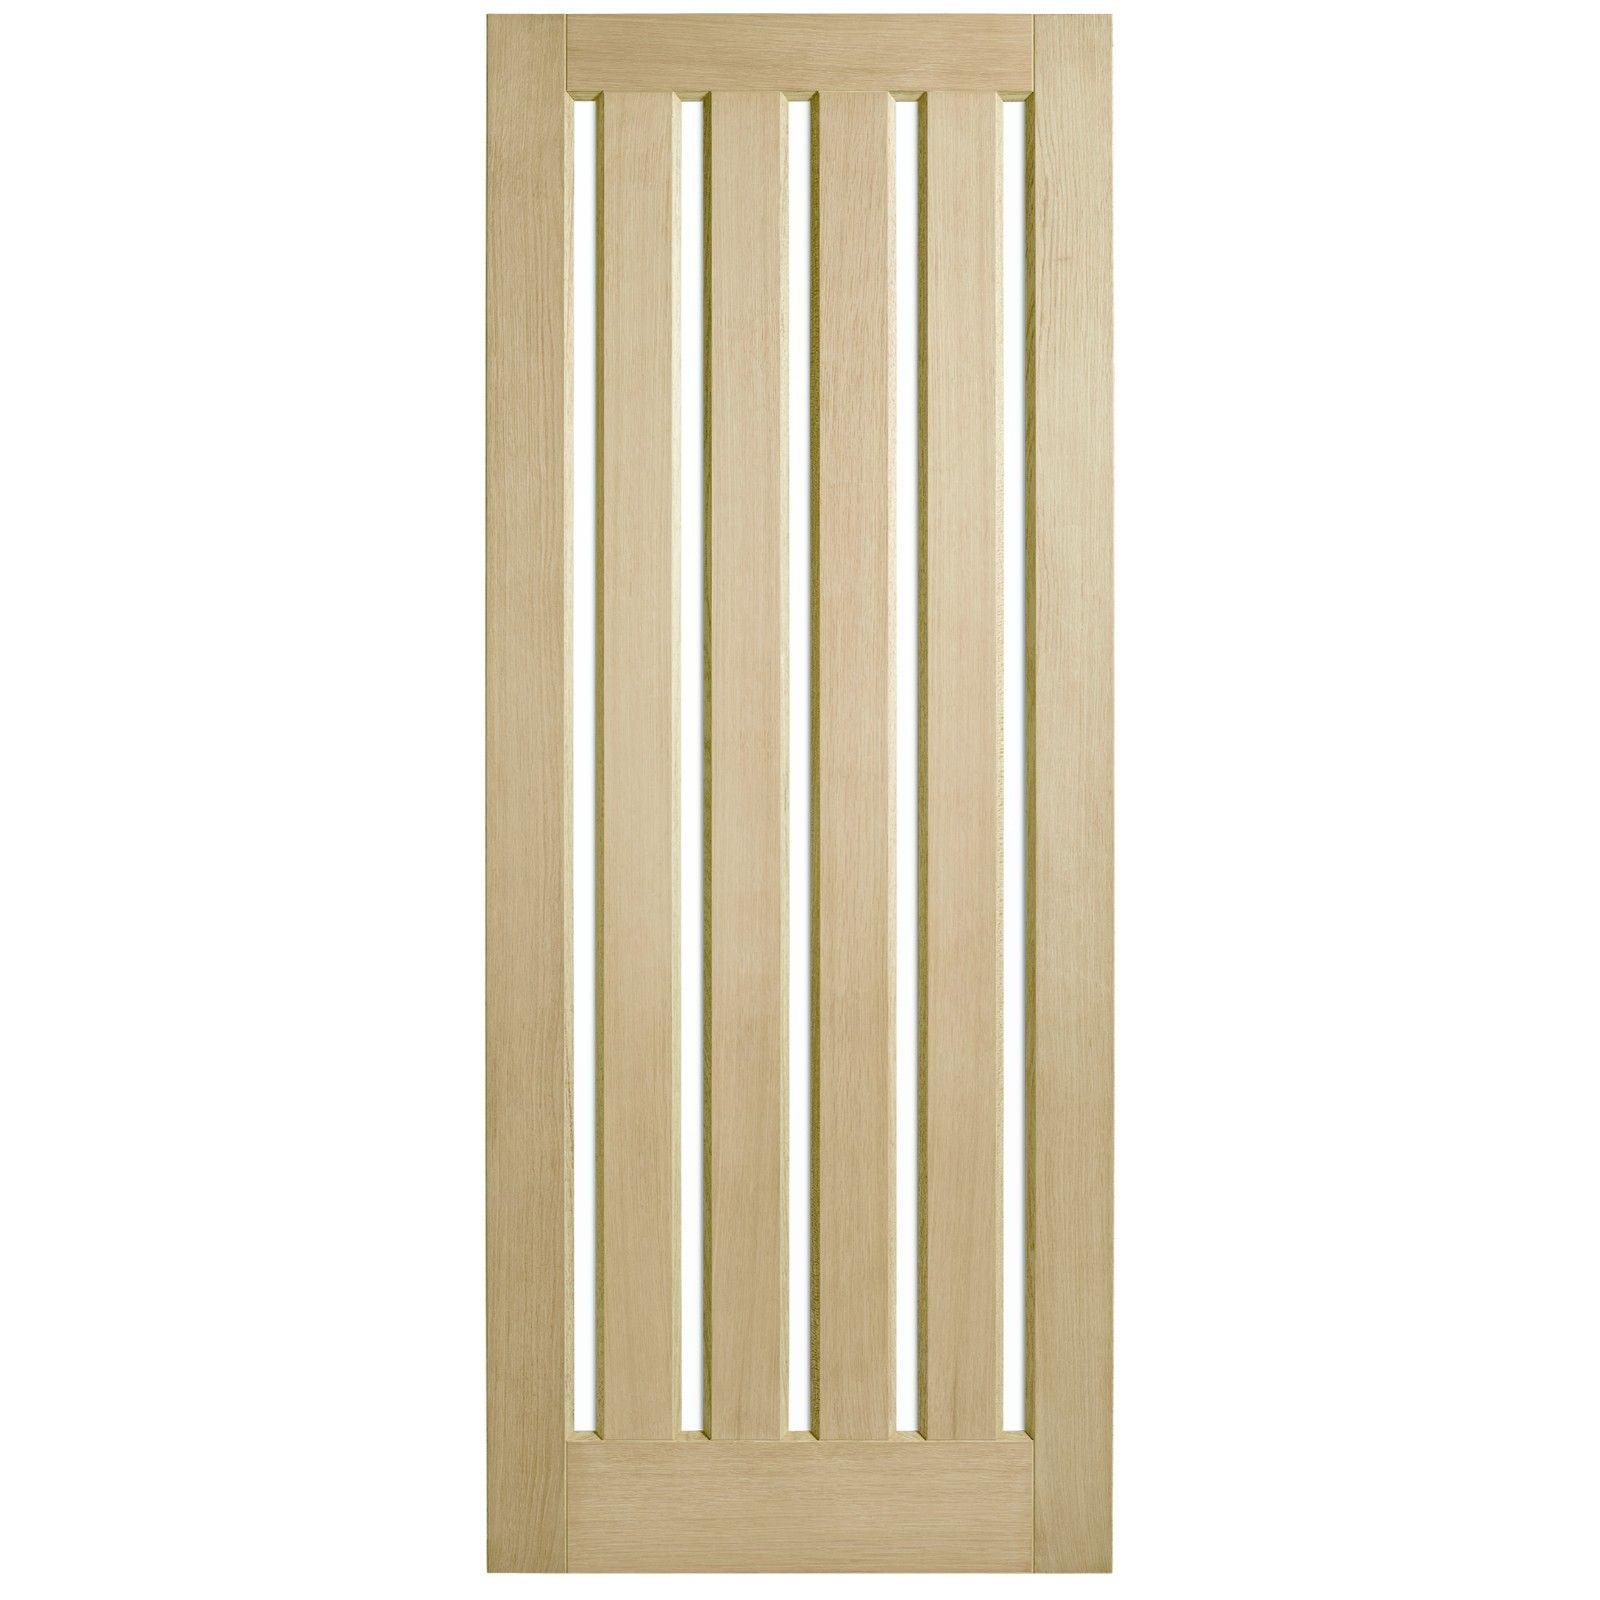 Corinthian Doors 820 X 2040 X 40mm Blonde Oak Awo 5vg Clear Glass Entrance Door Installing French Doors Glass Entrance Doors Cavity Sliding Doors